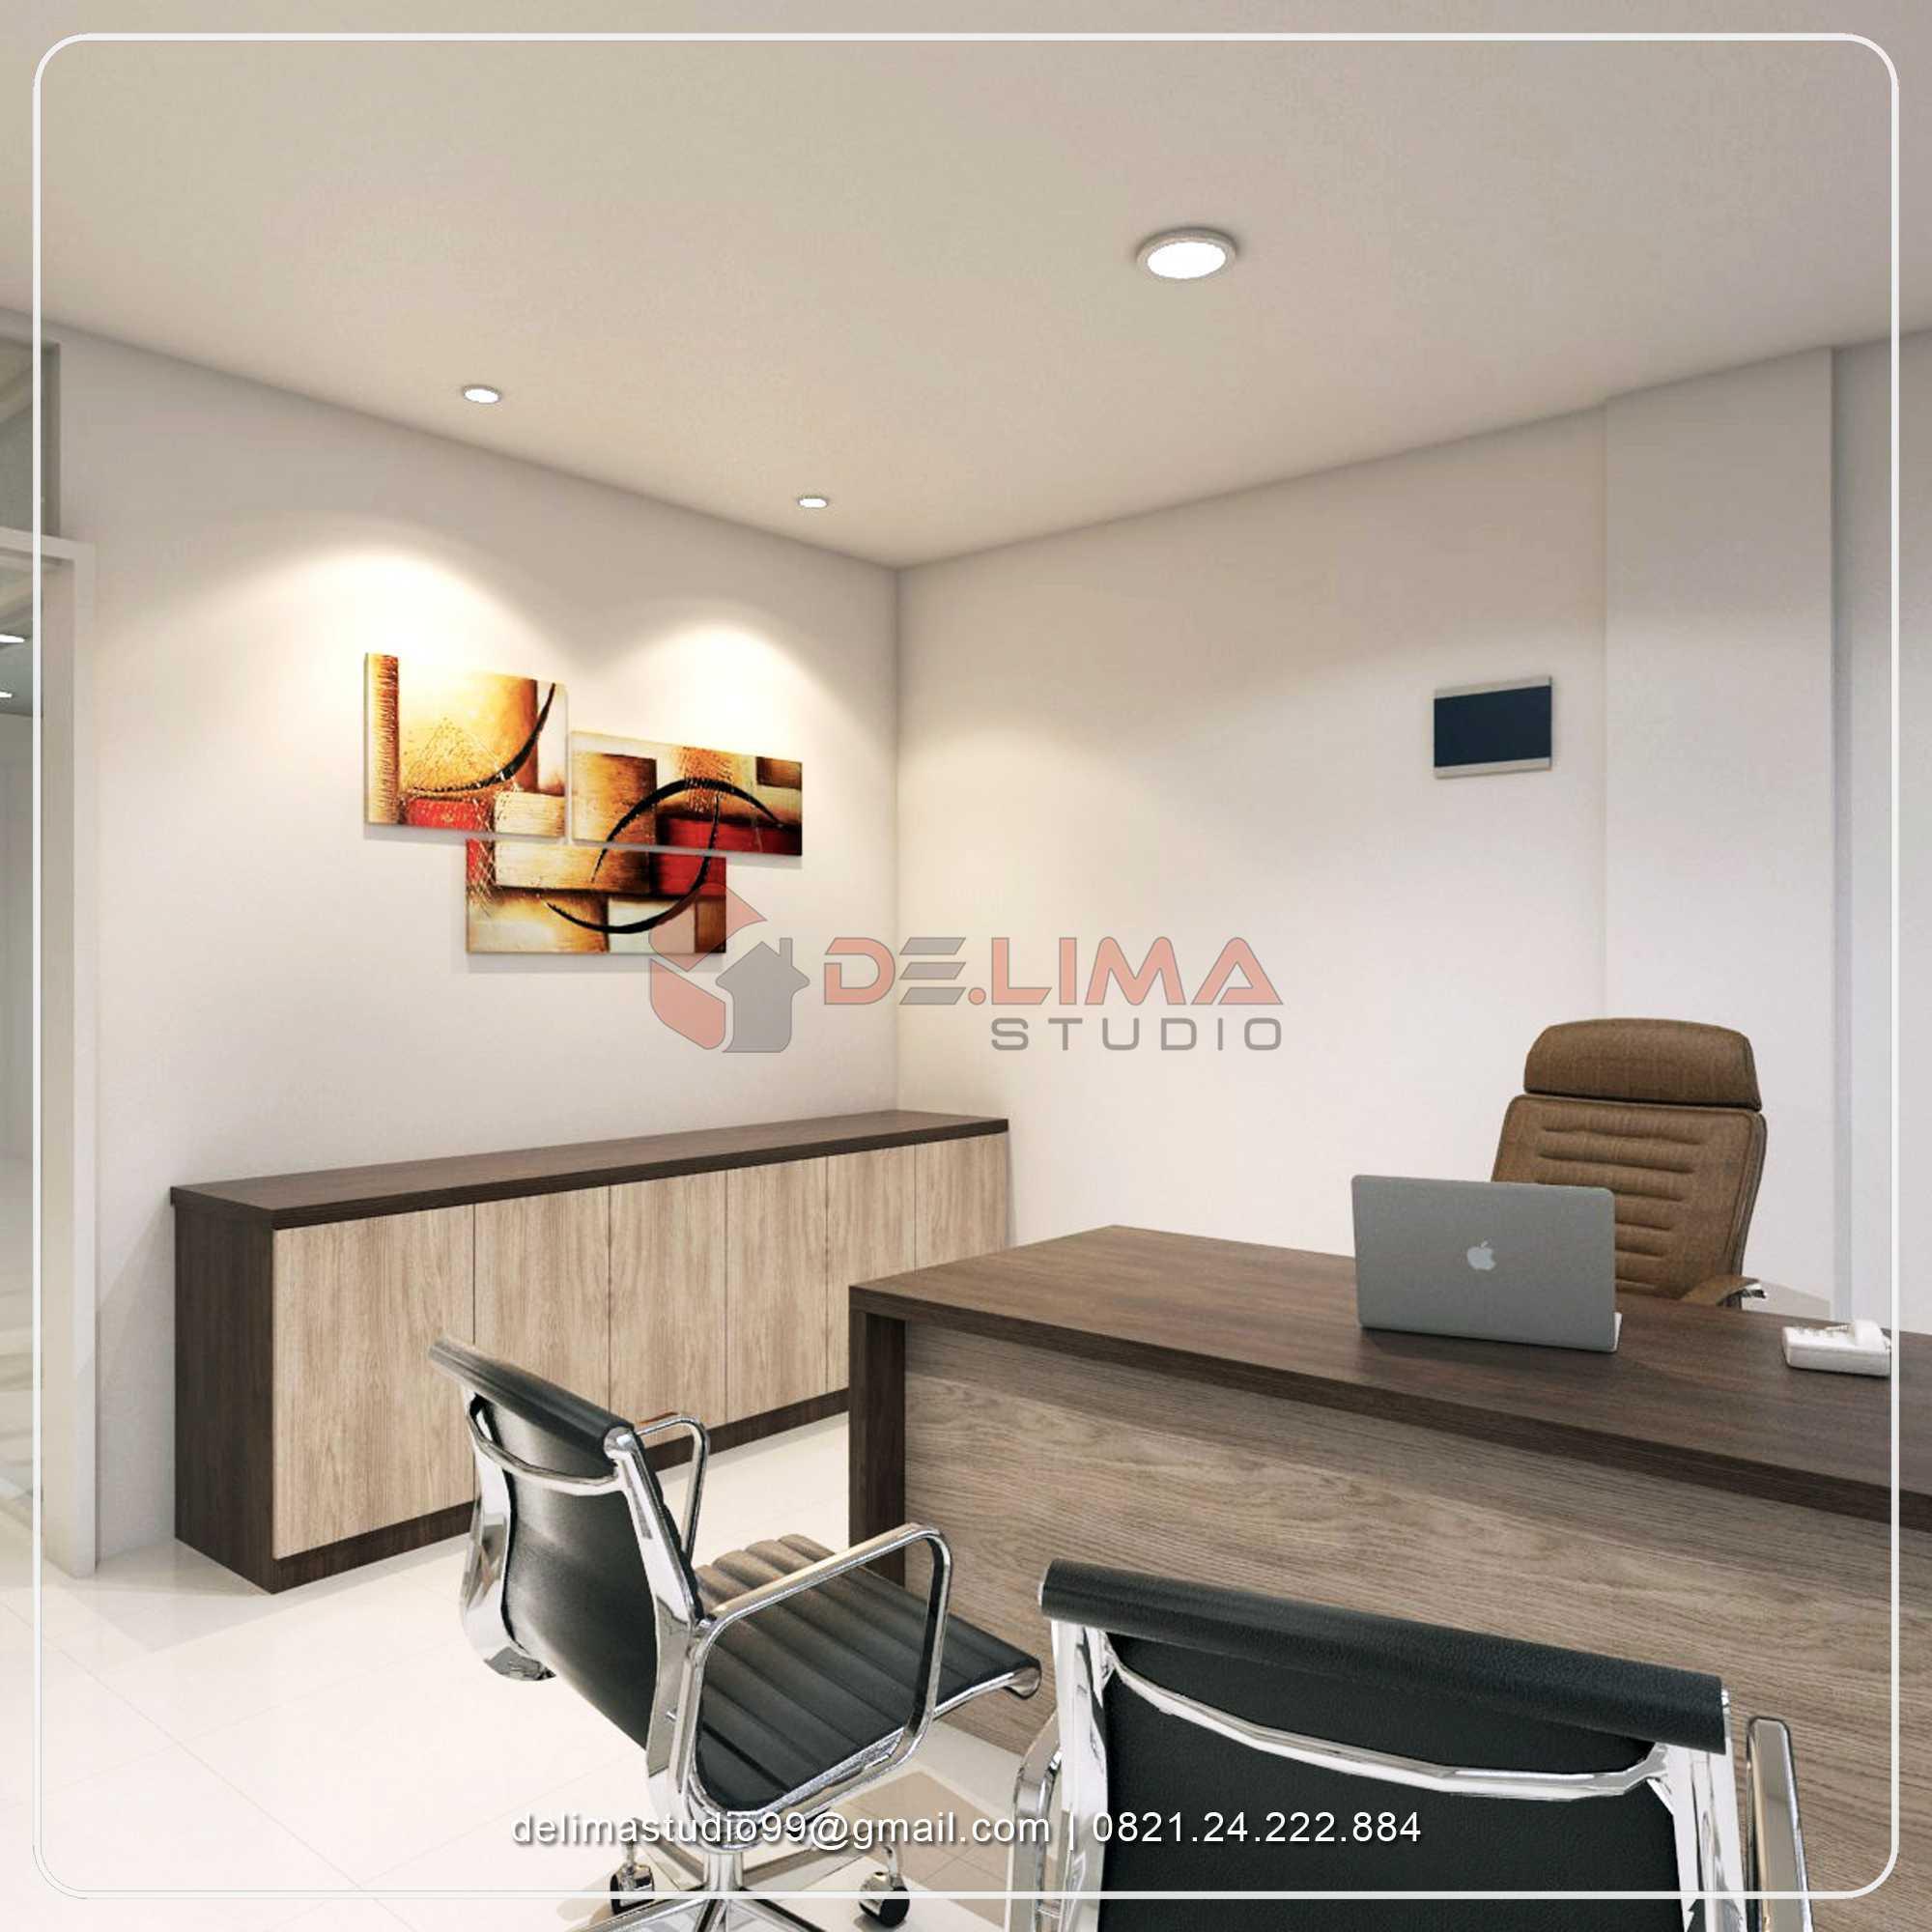 Delima Studio Office At Cikarang Sukamahi, Kec. Cikarang Pusat, Bekasi, Jawa Barat 17530, Indonesia Sukamahi, Kec. Cikarang Pusat, Bekasi, Jawa Barat 17530, Indonesia Delima-Studio-Office-At-Cikarang Modern  77711